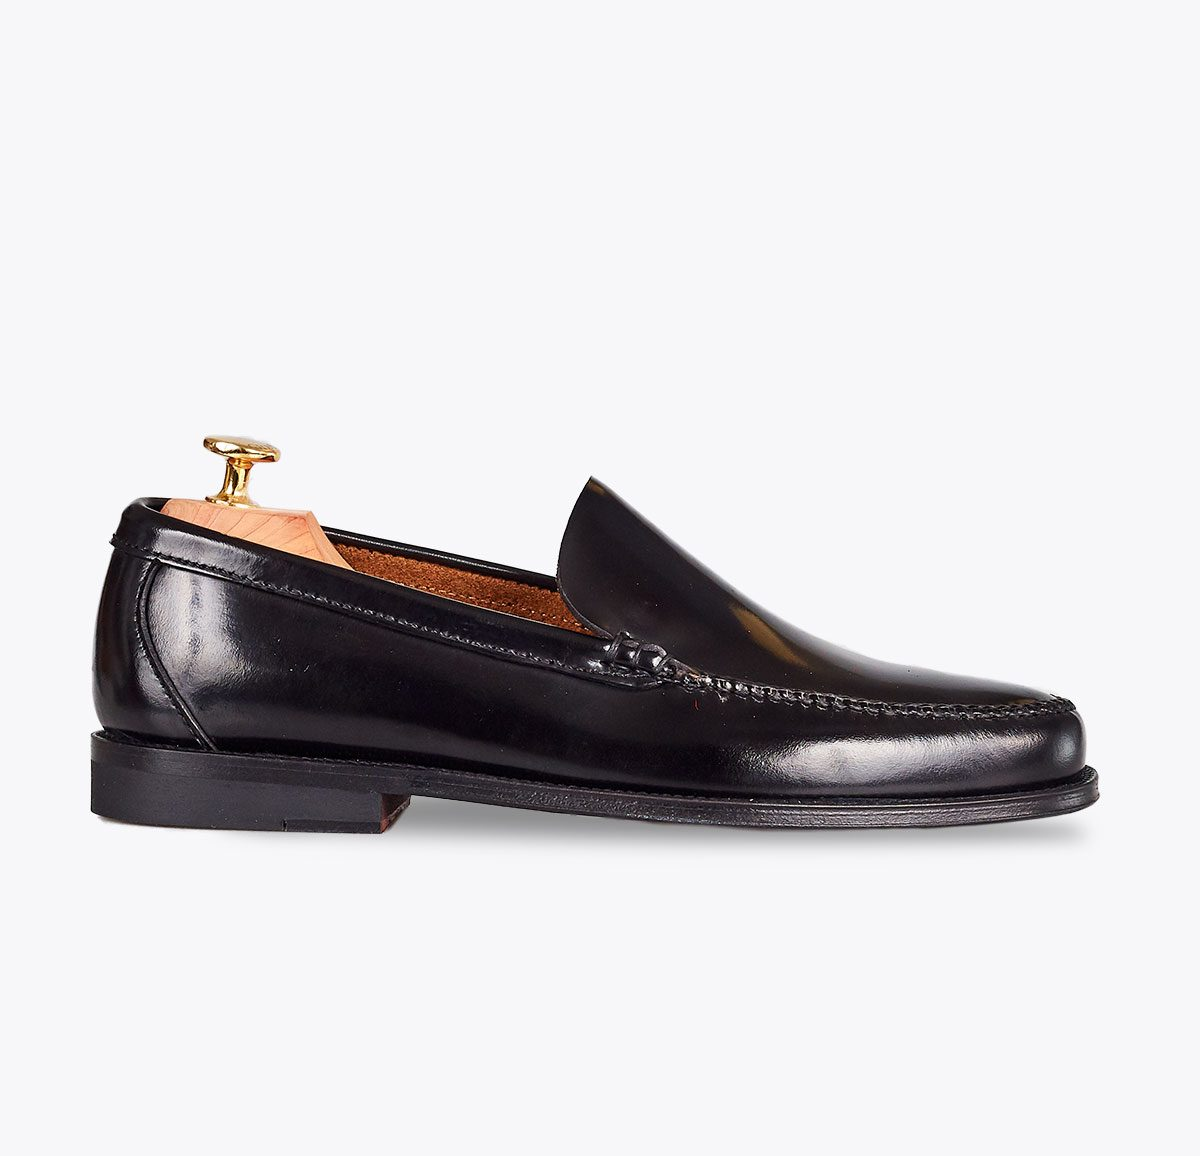 Zapato castellano liso negro hecho a mano en mandalashoes, Santanyí Mallorca. Hand made shoes. Nach Mass Schuhe